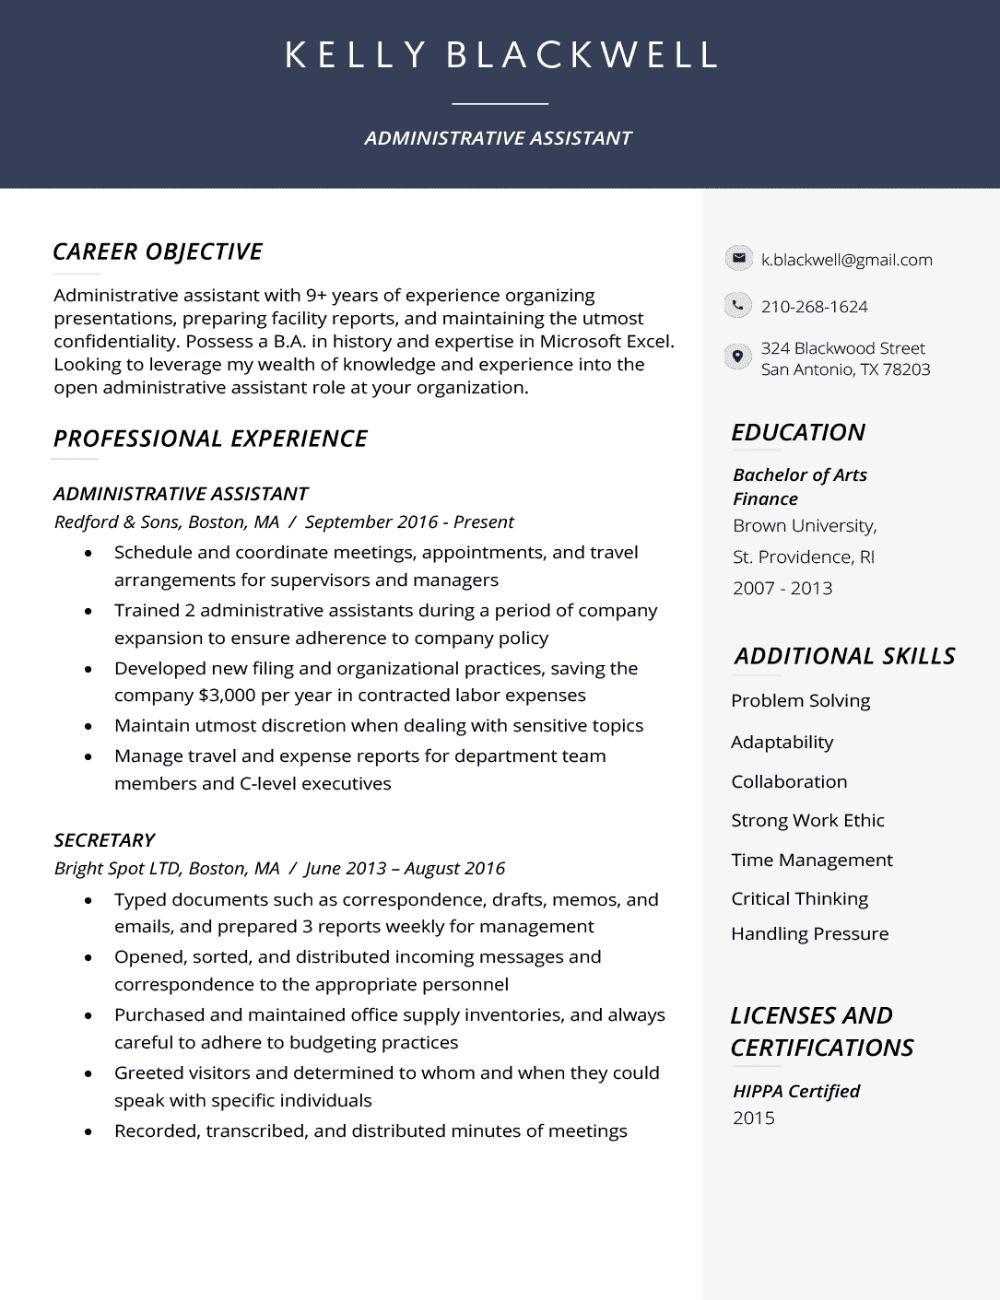 Resume Builder in 2020 Resume builder, Resume, Cover